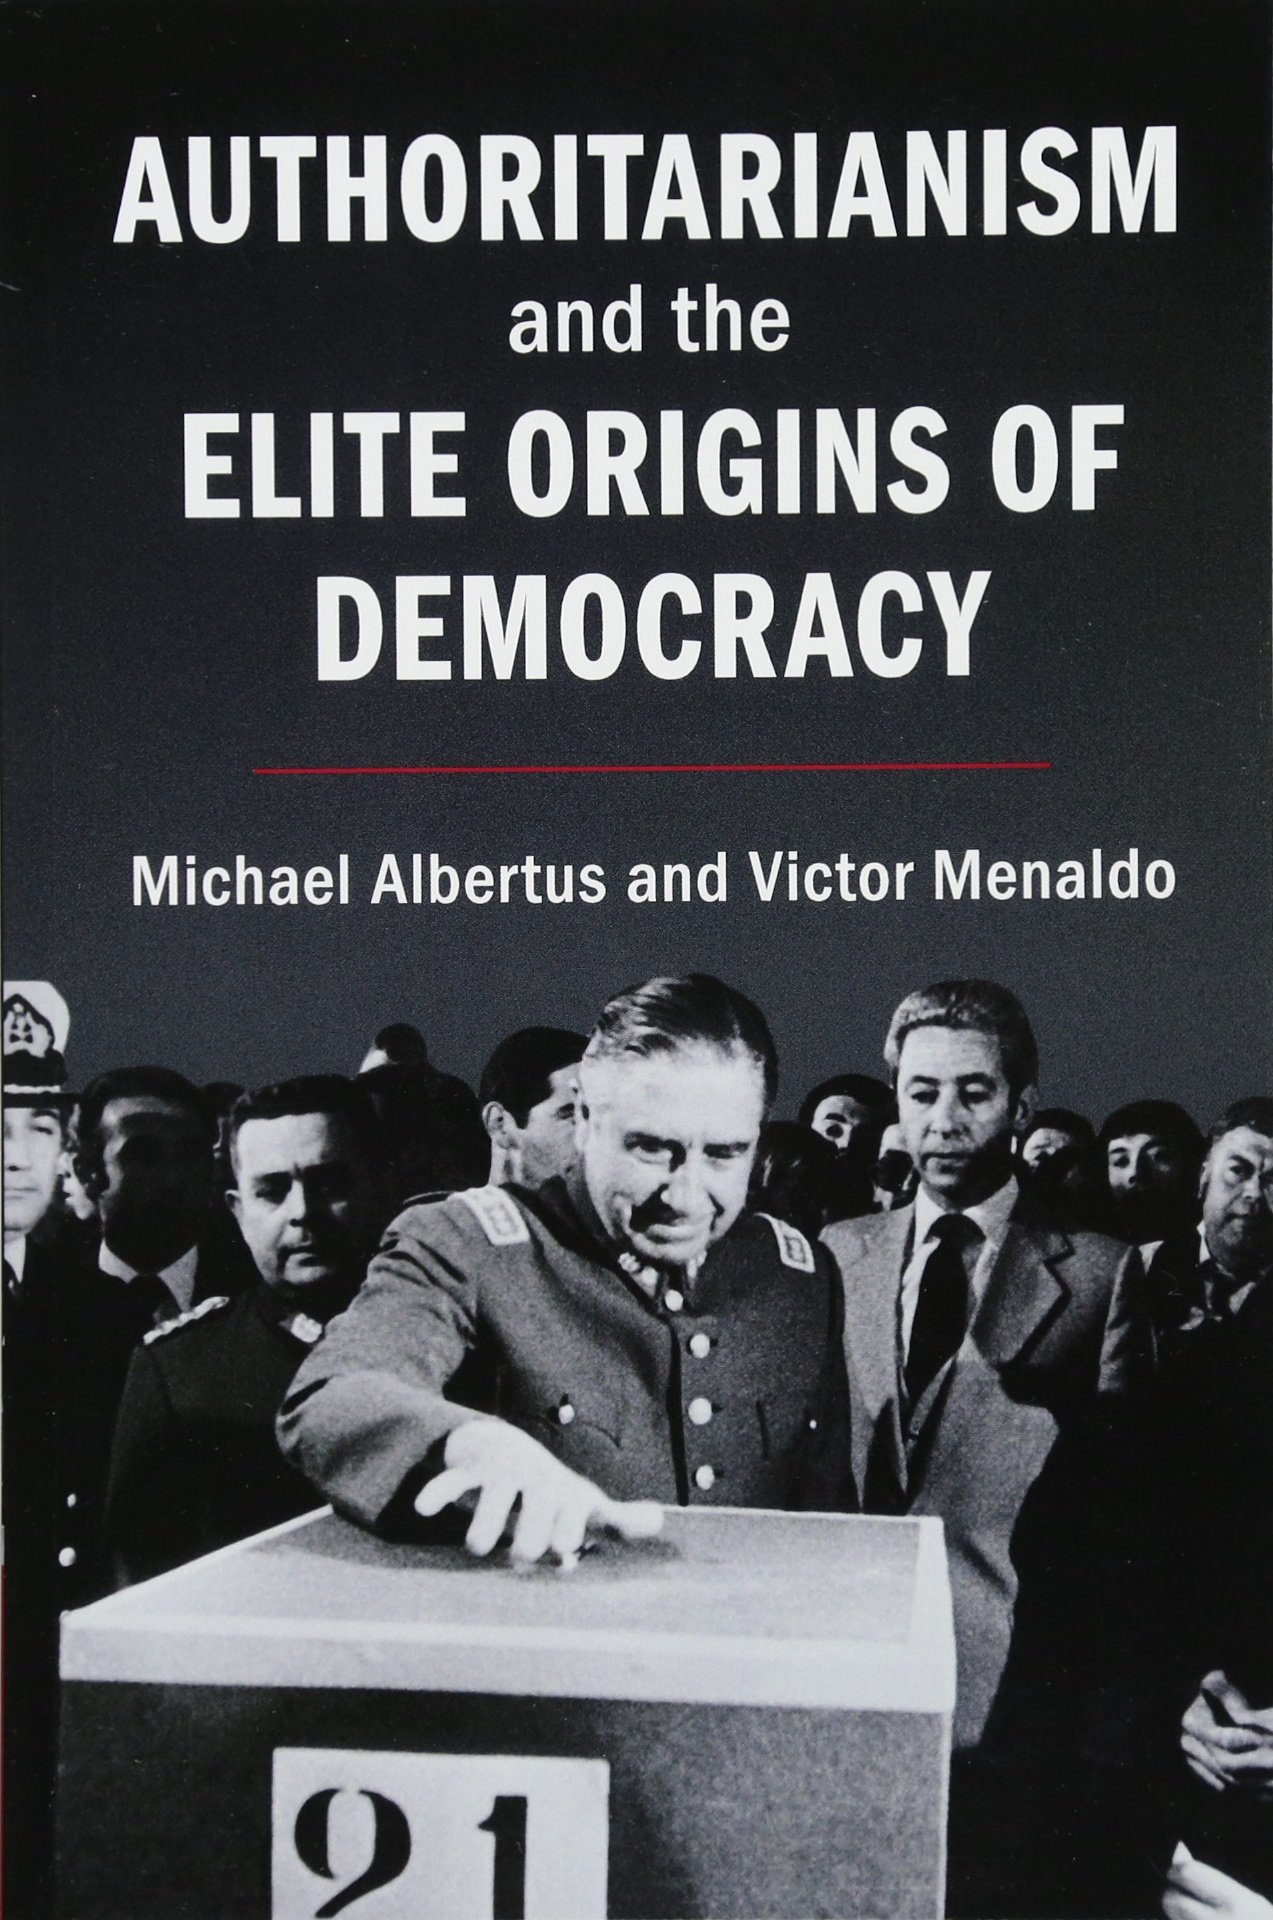 authoritarianism-and-the-elite-origins-of-democracy